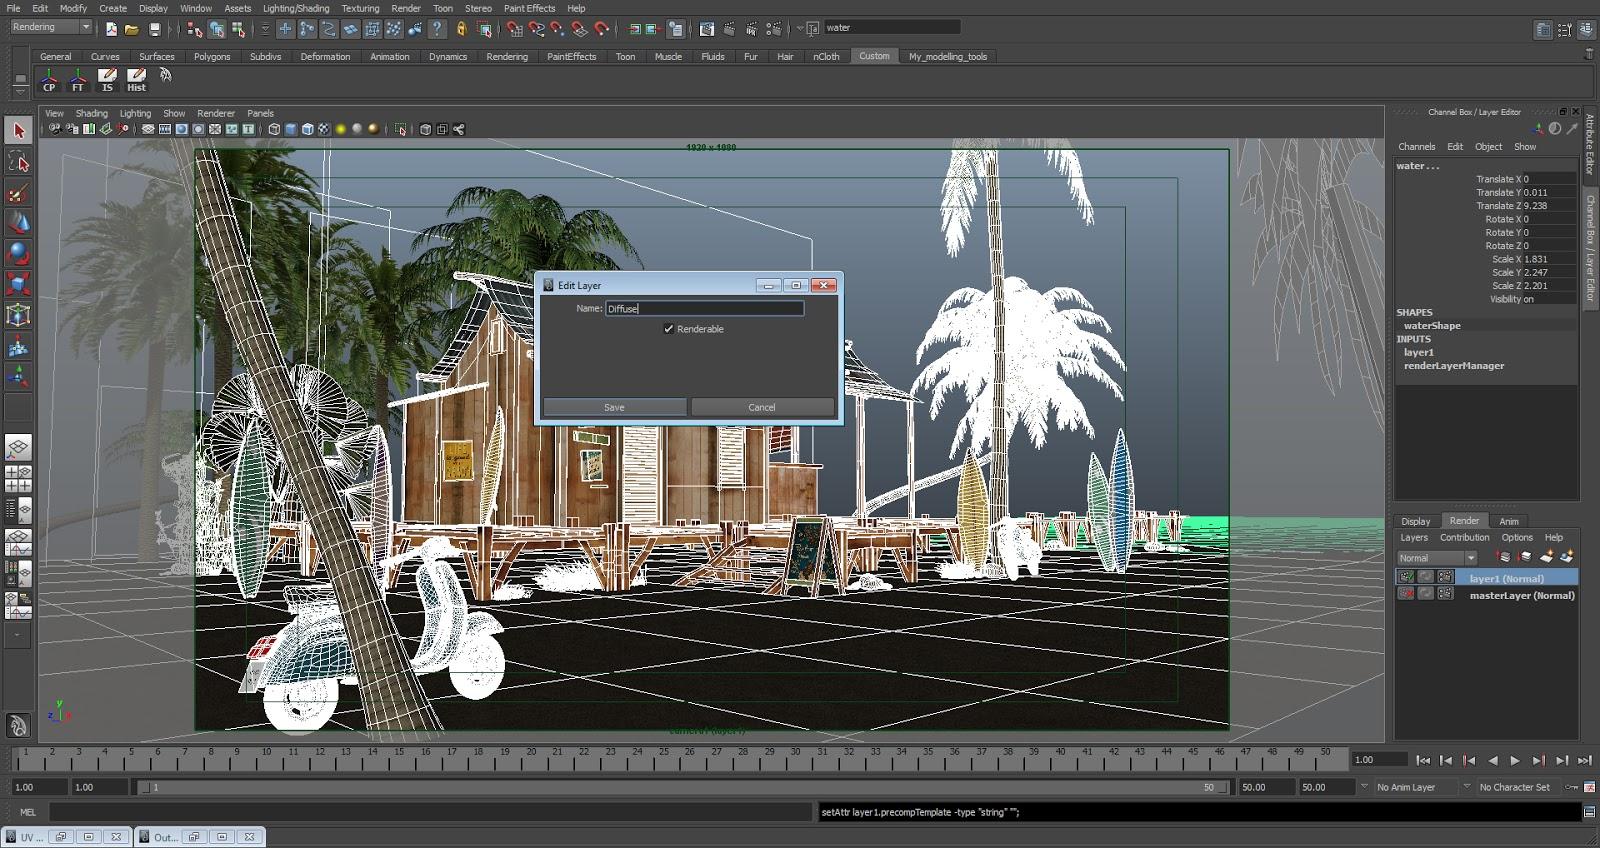 Creating passes in Autodesk Maya 2013 | Animtion tut